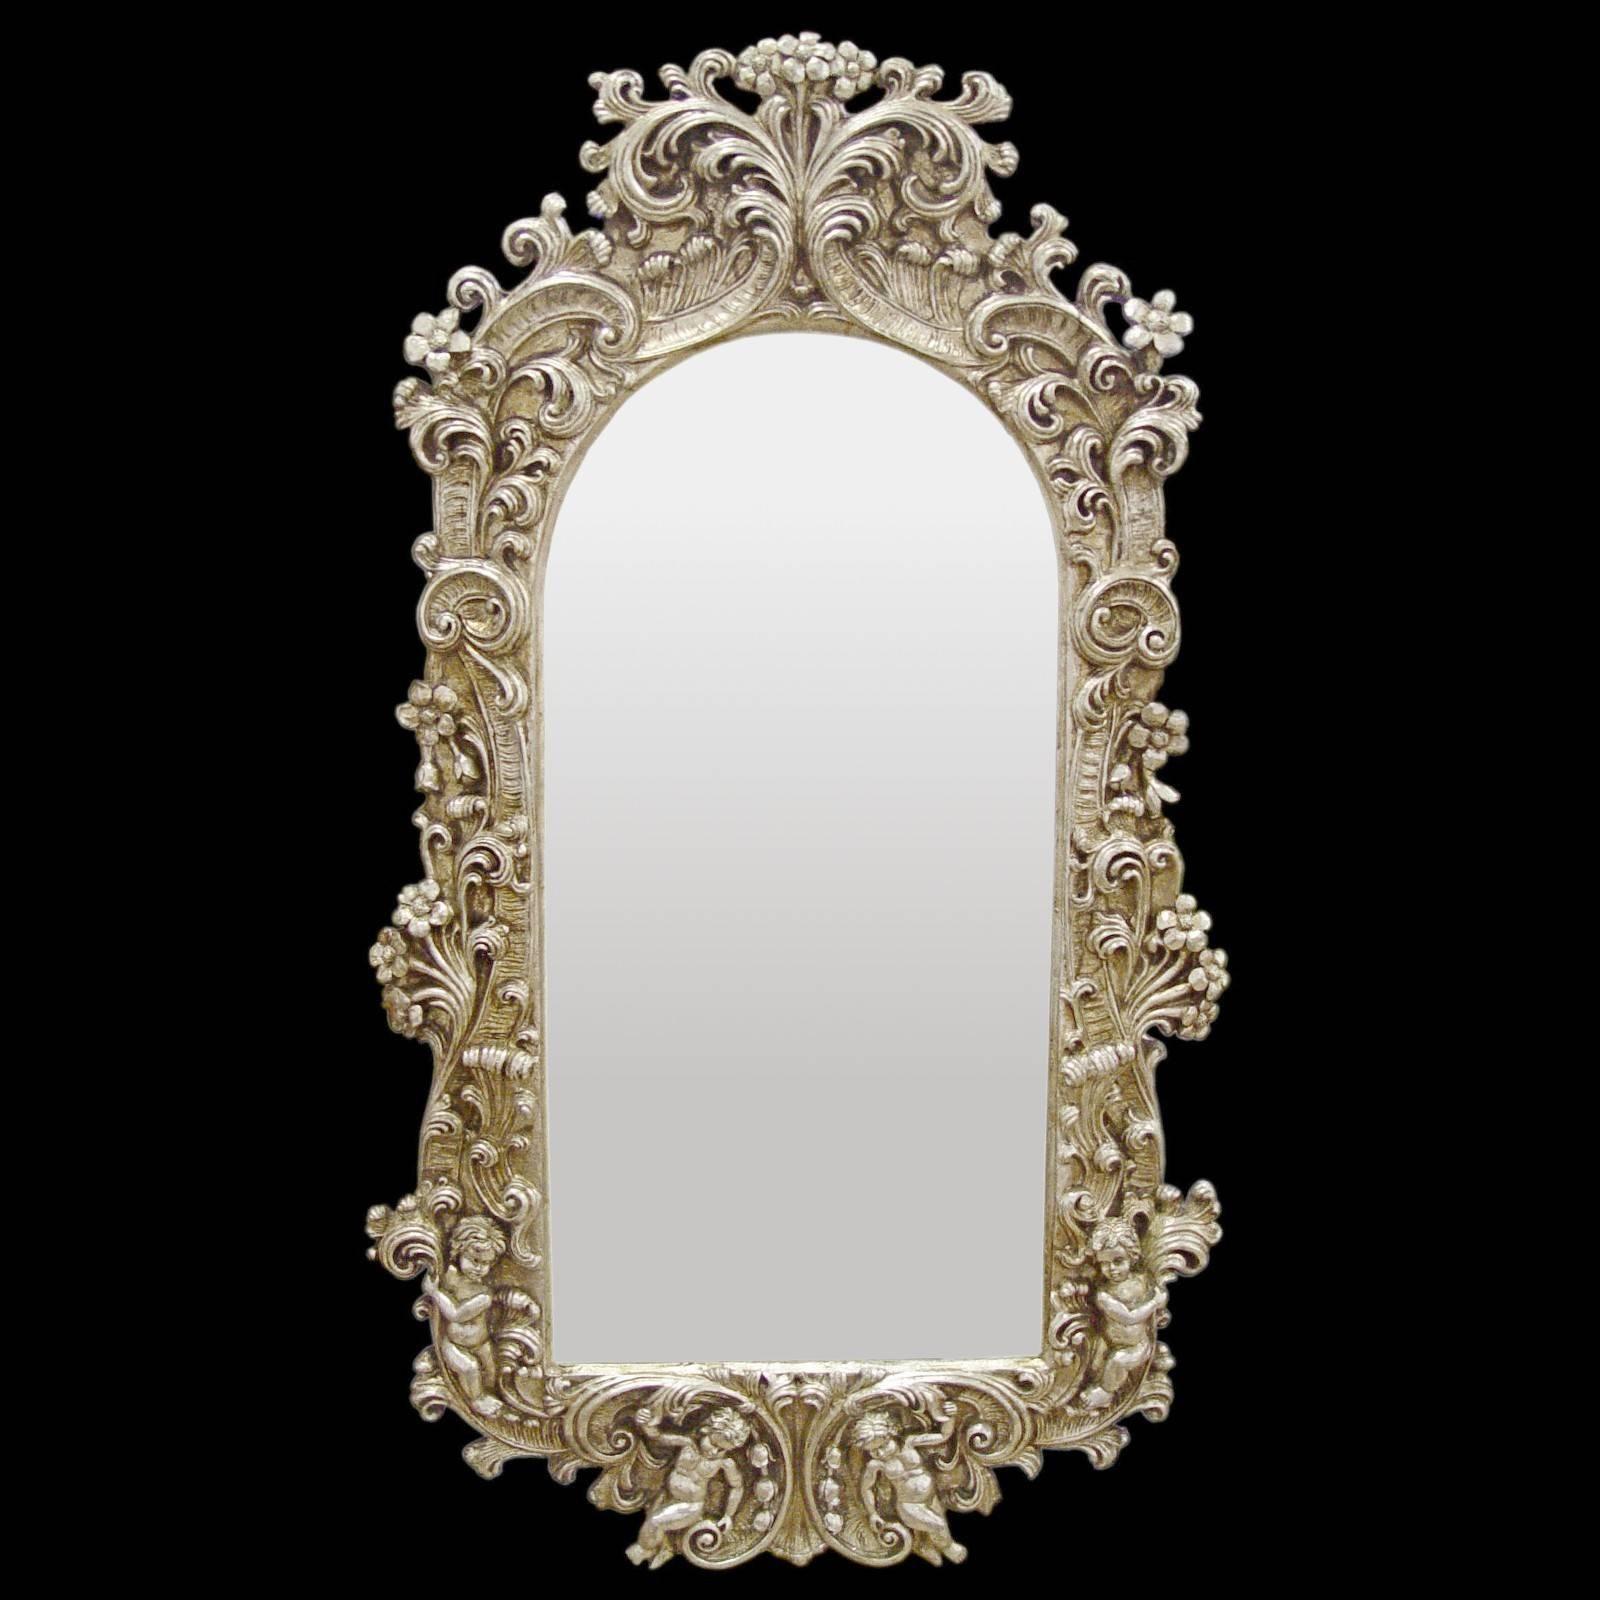 Wall Furniture Baroque Splendor Mirror Frame Baroque Silver regarding Baroque Wall Mirrors (Image 14 of 15)